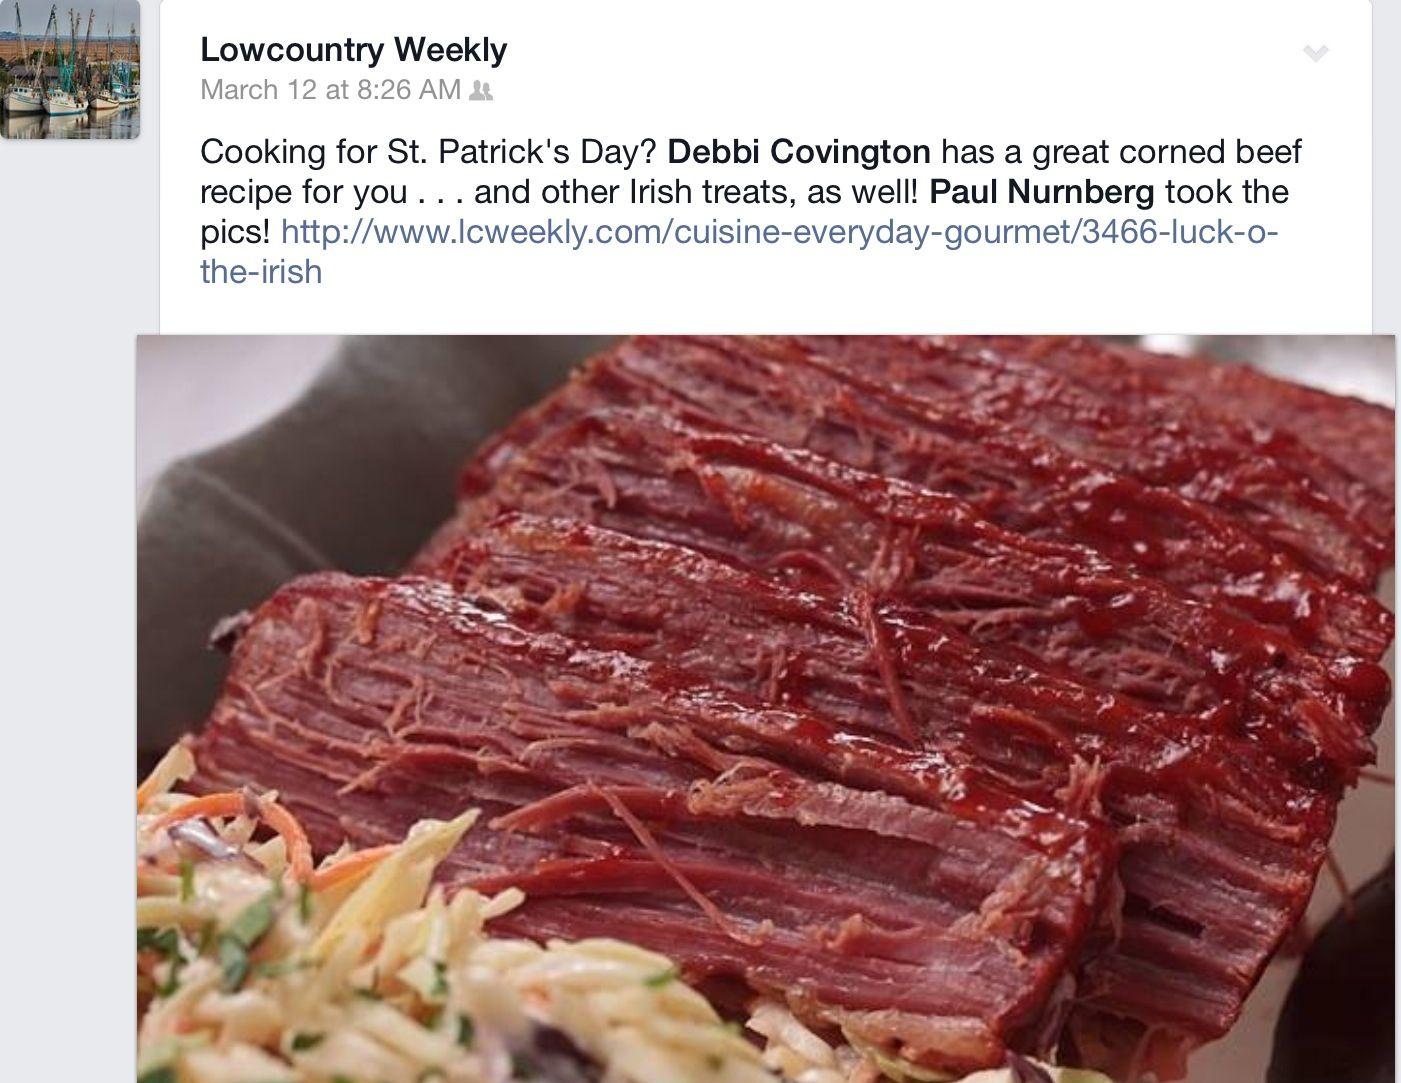 Everyday Gourmet - March 12, 2014 www.cateringbydebbicovington.com